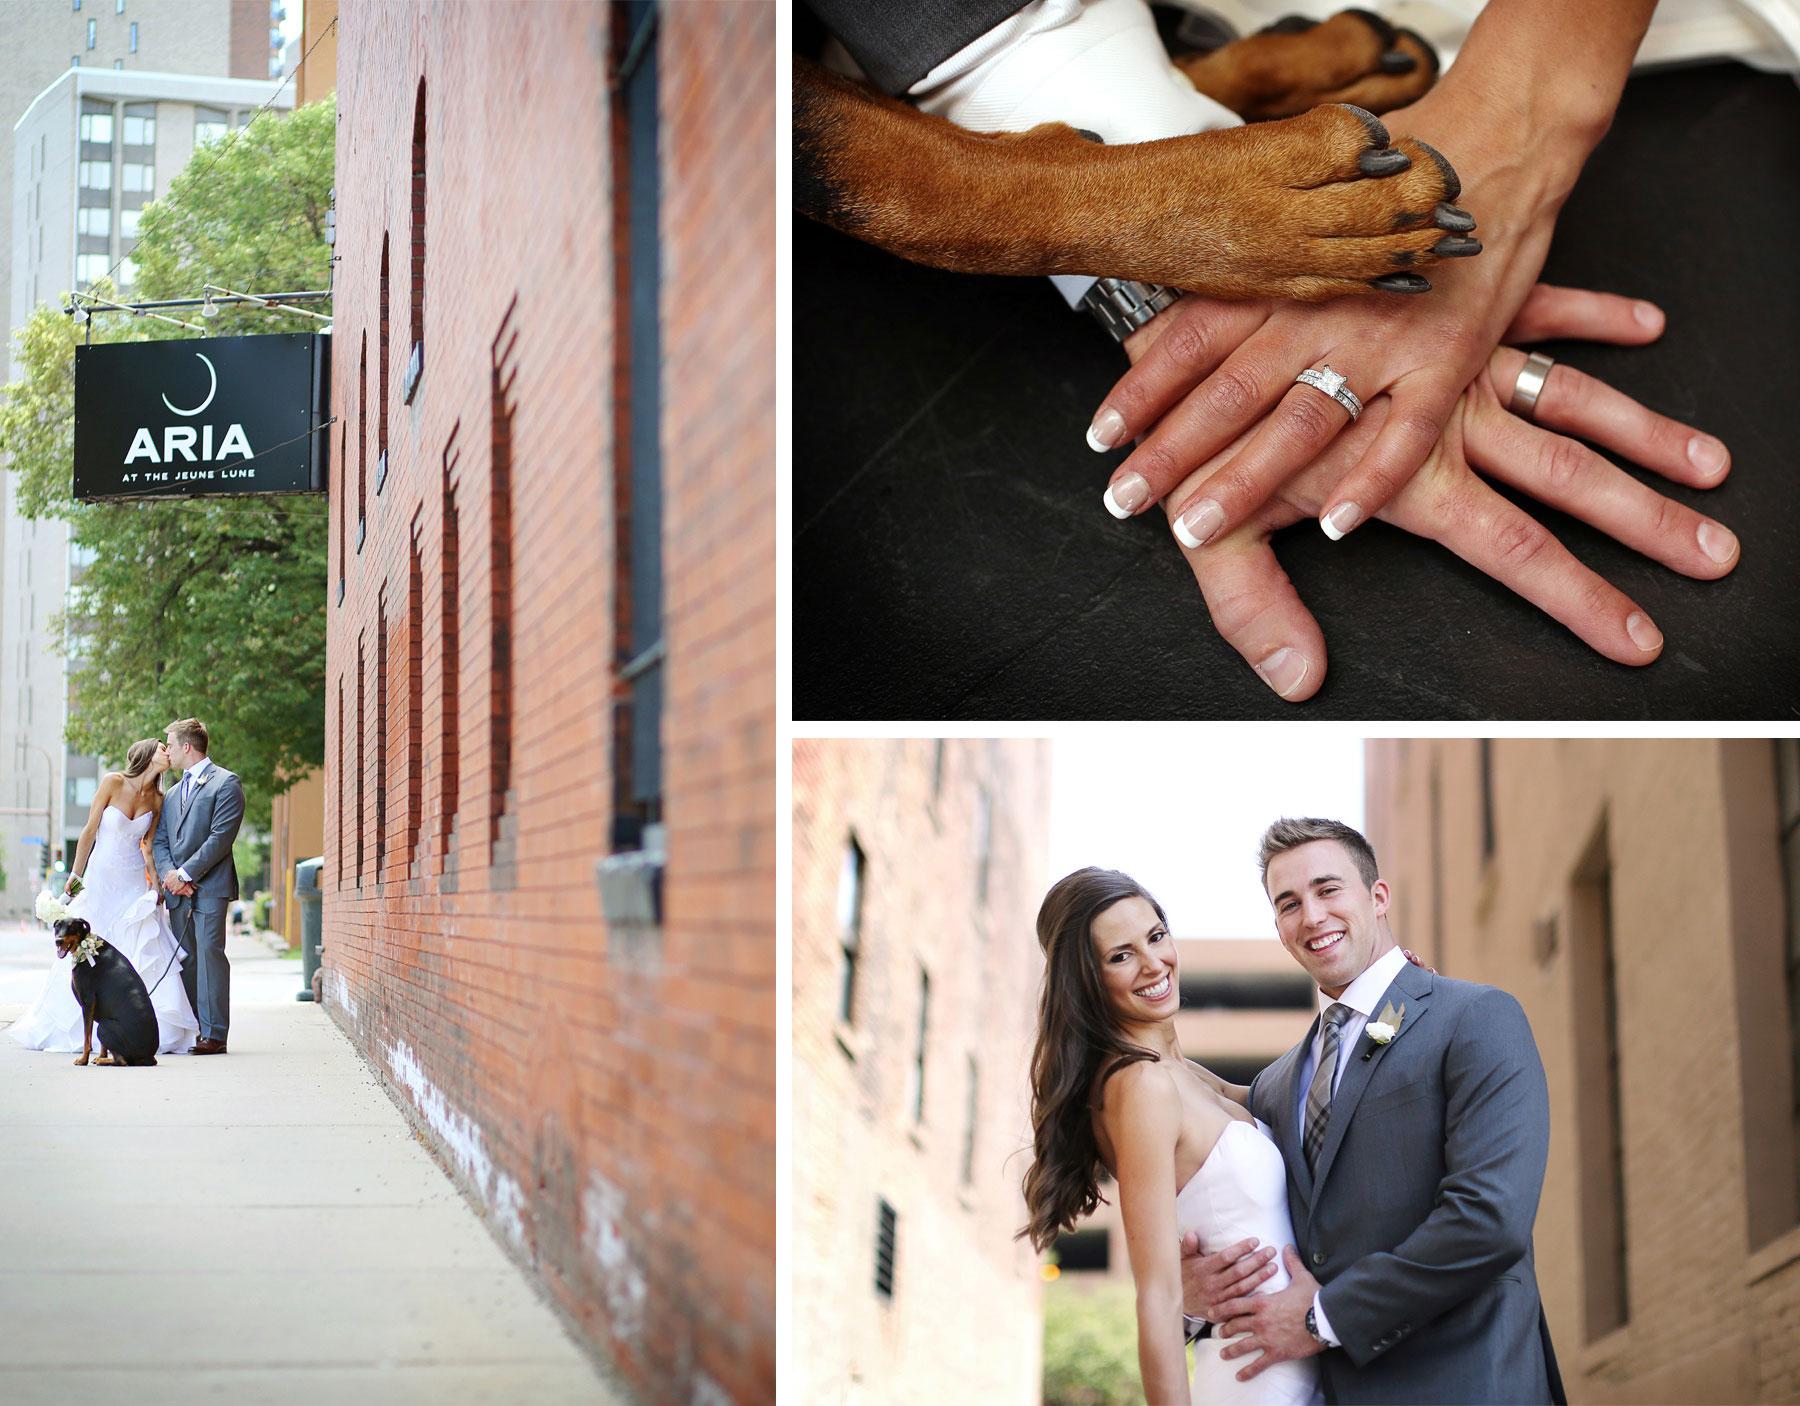 06-Minneapolis-Minnesota-Wedding-Photography-by-Vick-Photography-Aria-Dog-Portrait-Katie-&-Joe.jpg